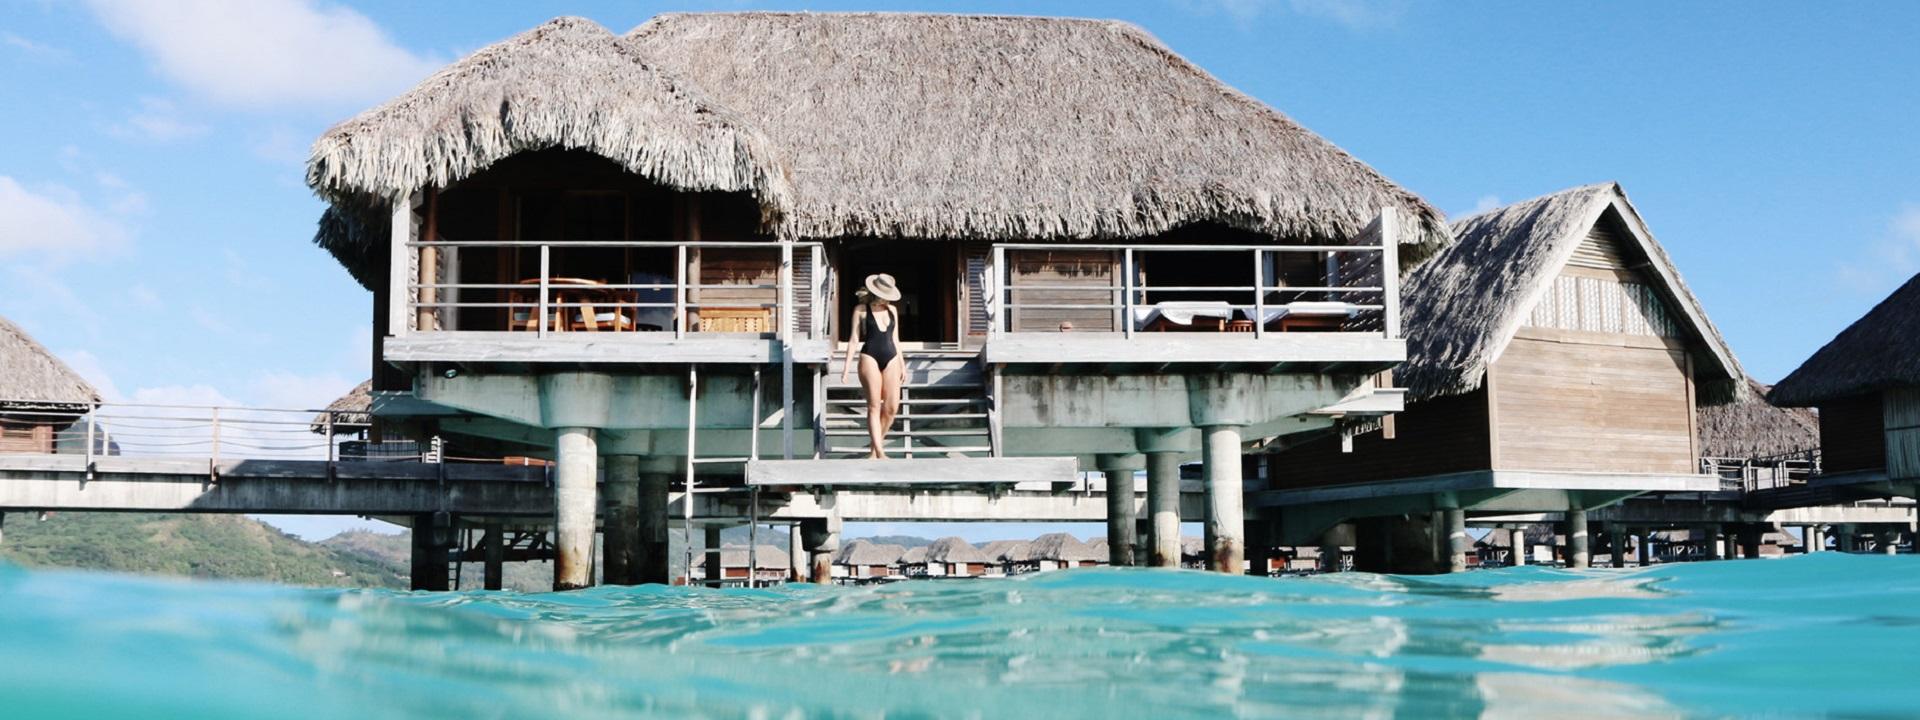 7 Night Bora Bora Vacation Featuring The Four Seasons Resort